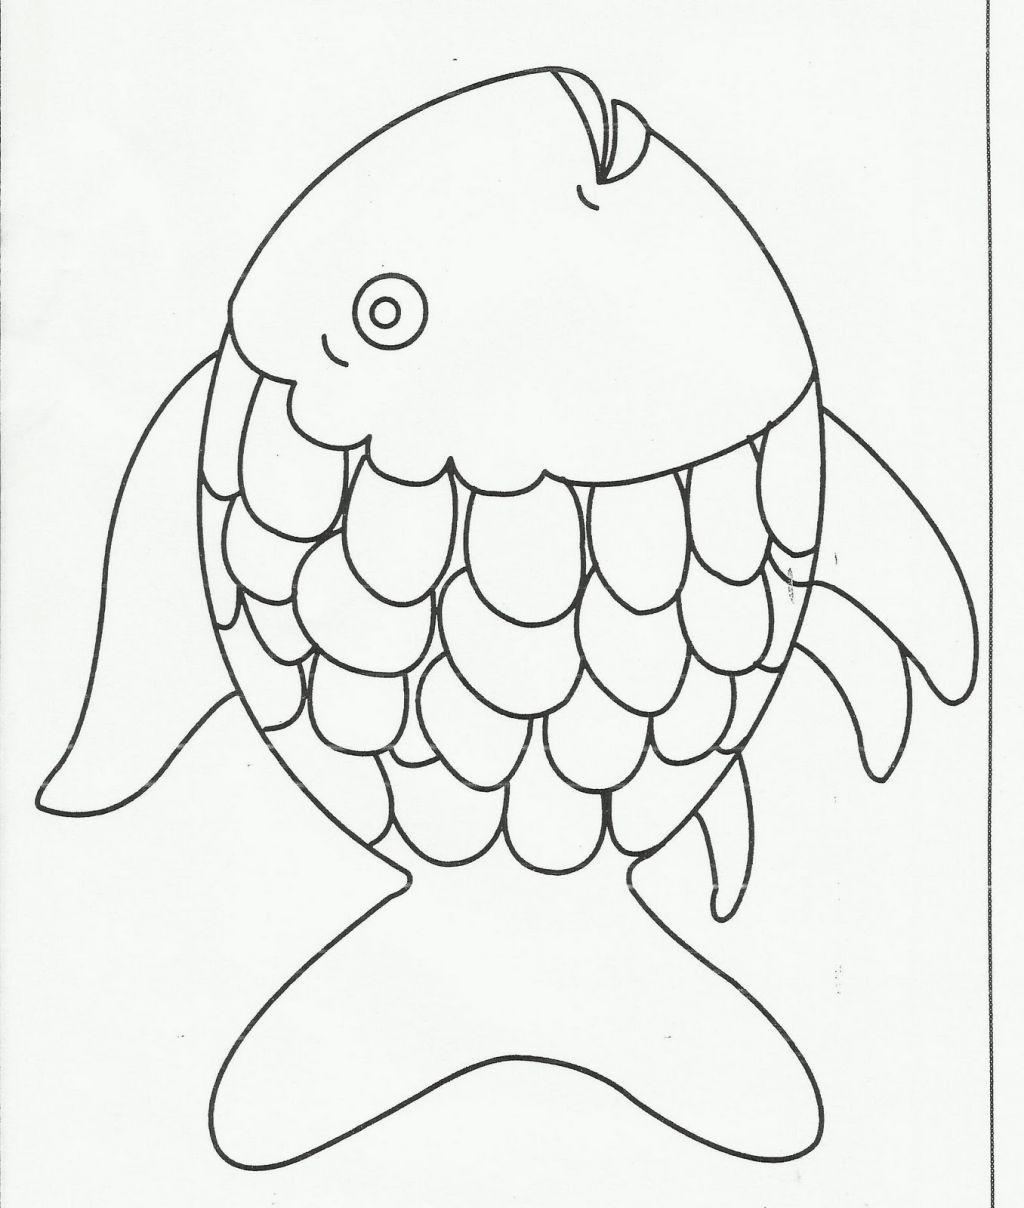 Rainbow Fish Coloring Sheet Coloring Pages Rainbow Fish Coloring Page Rainbow Fish Template Rainbow Fish